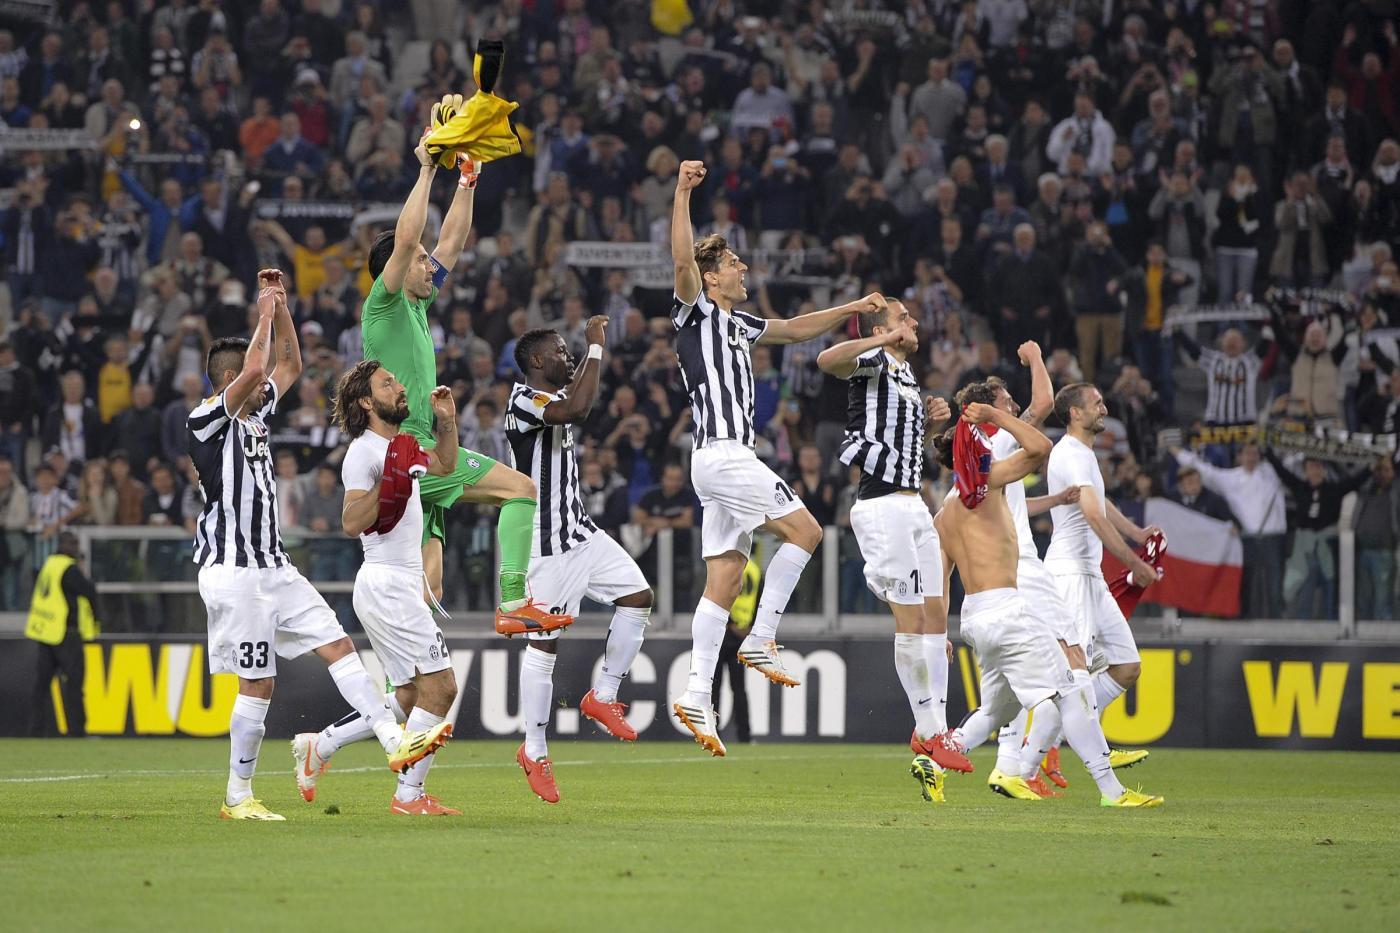 Juventus vs Lione 2-1: bianconeri qualificati alle semifinali di Europa League